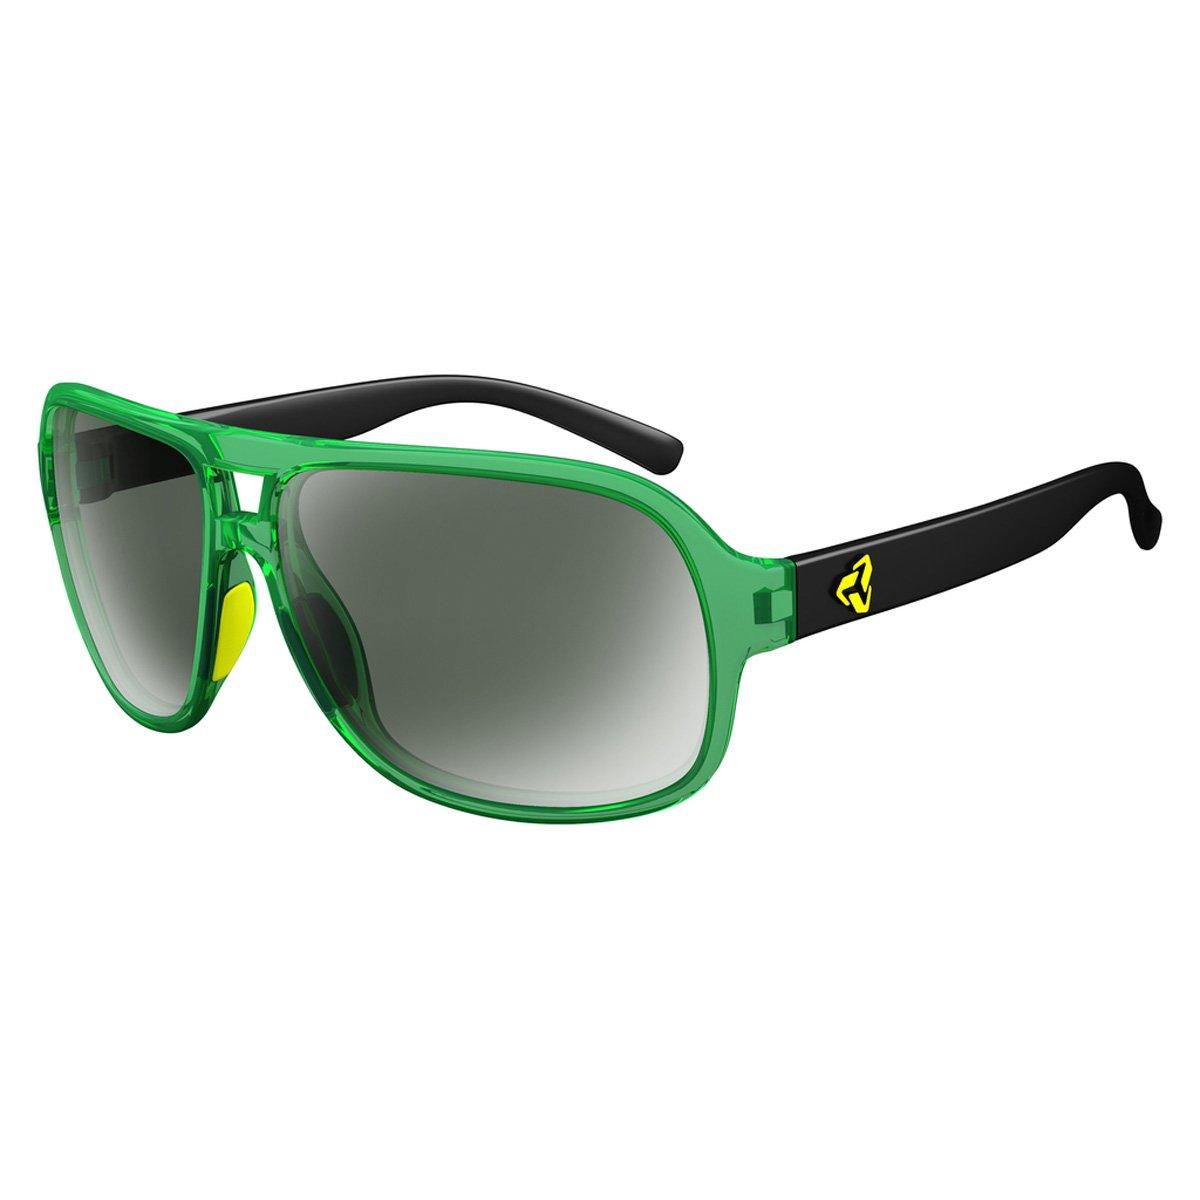 Ryders Eyewear Pint偏光サングラス – 2トーン  GREEN XTAL-BLACK / GREEN LENS FM B01E81CEFK